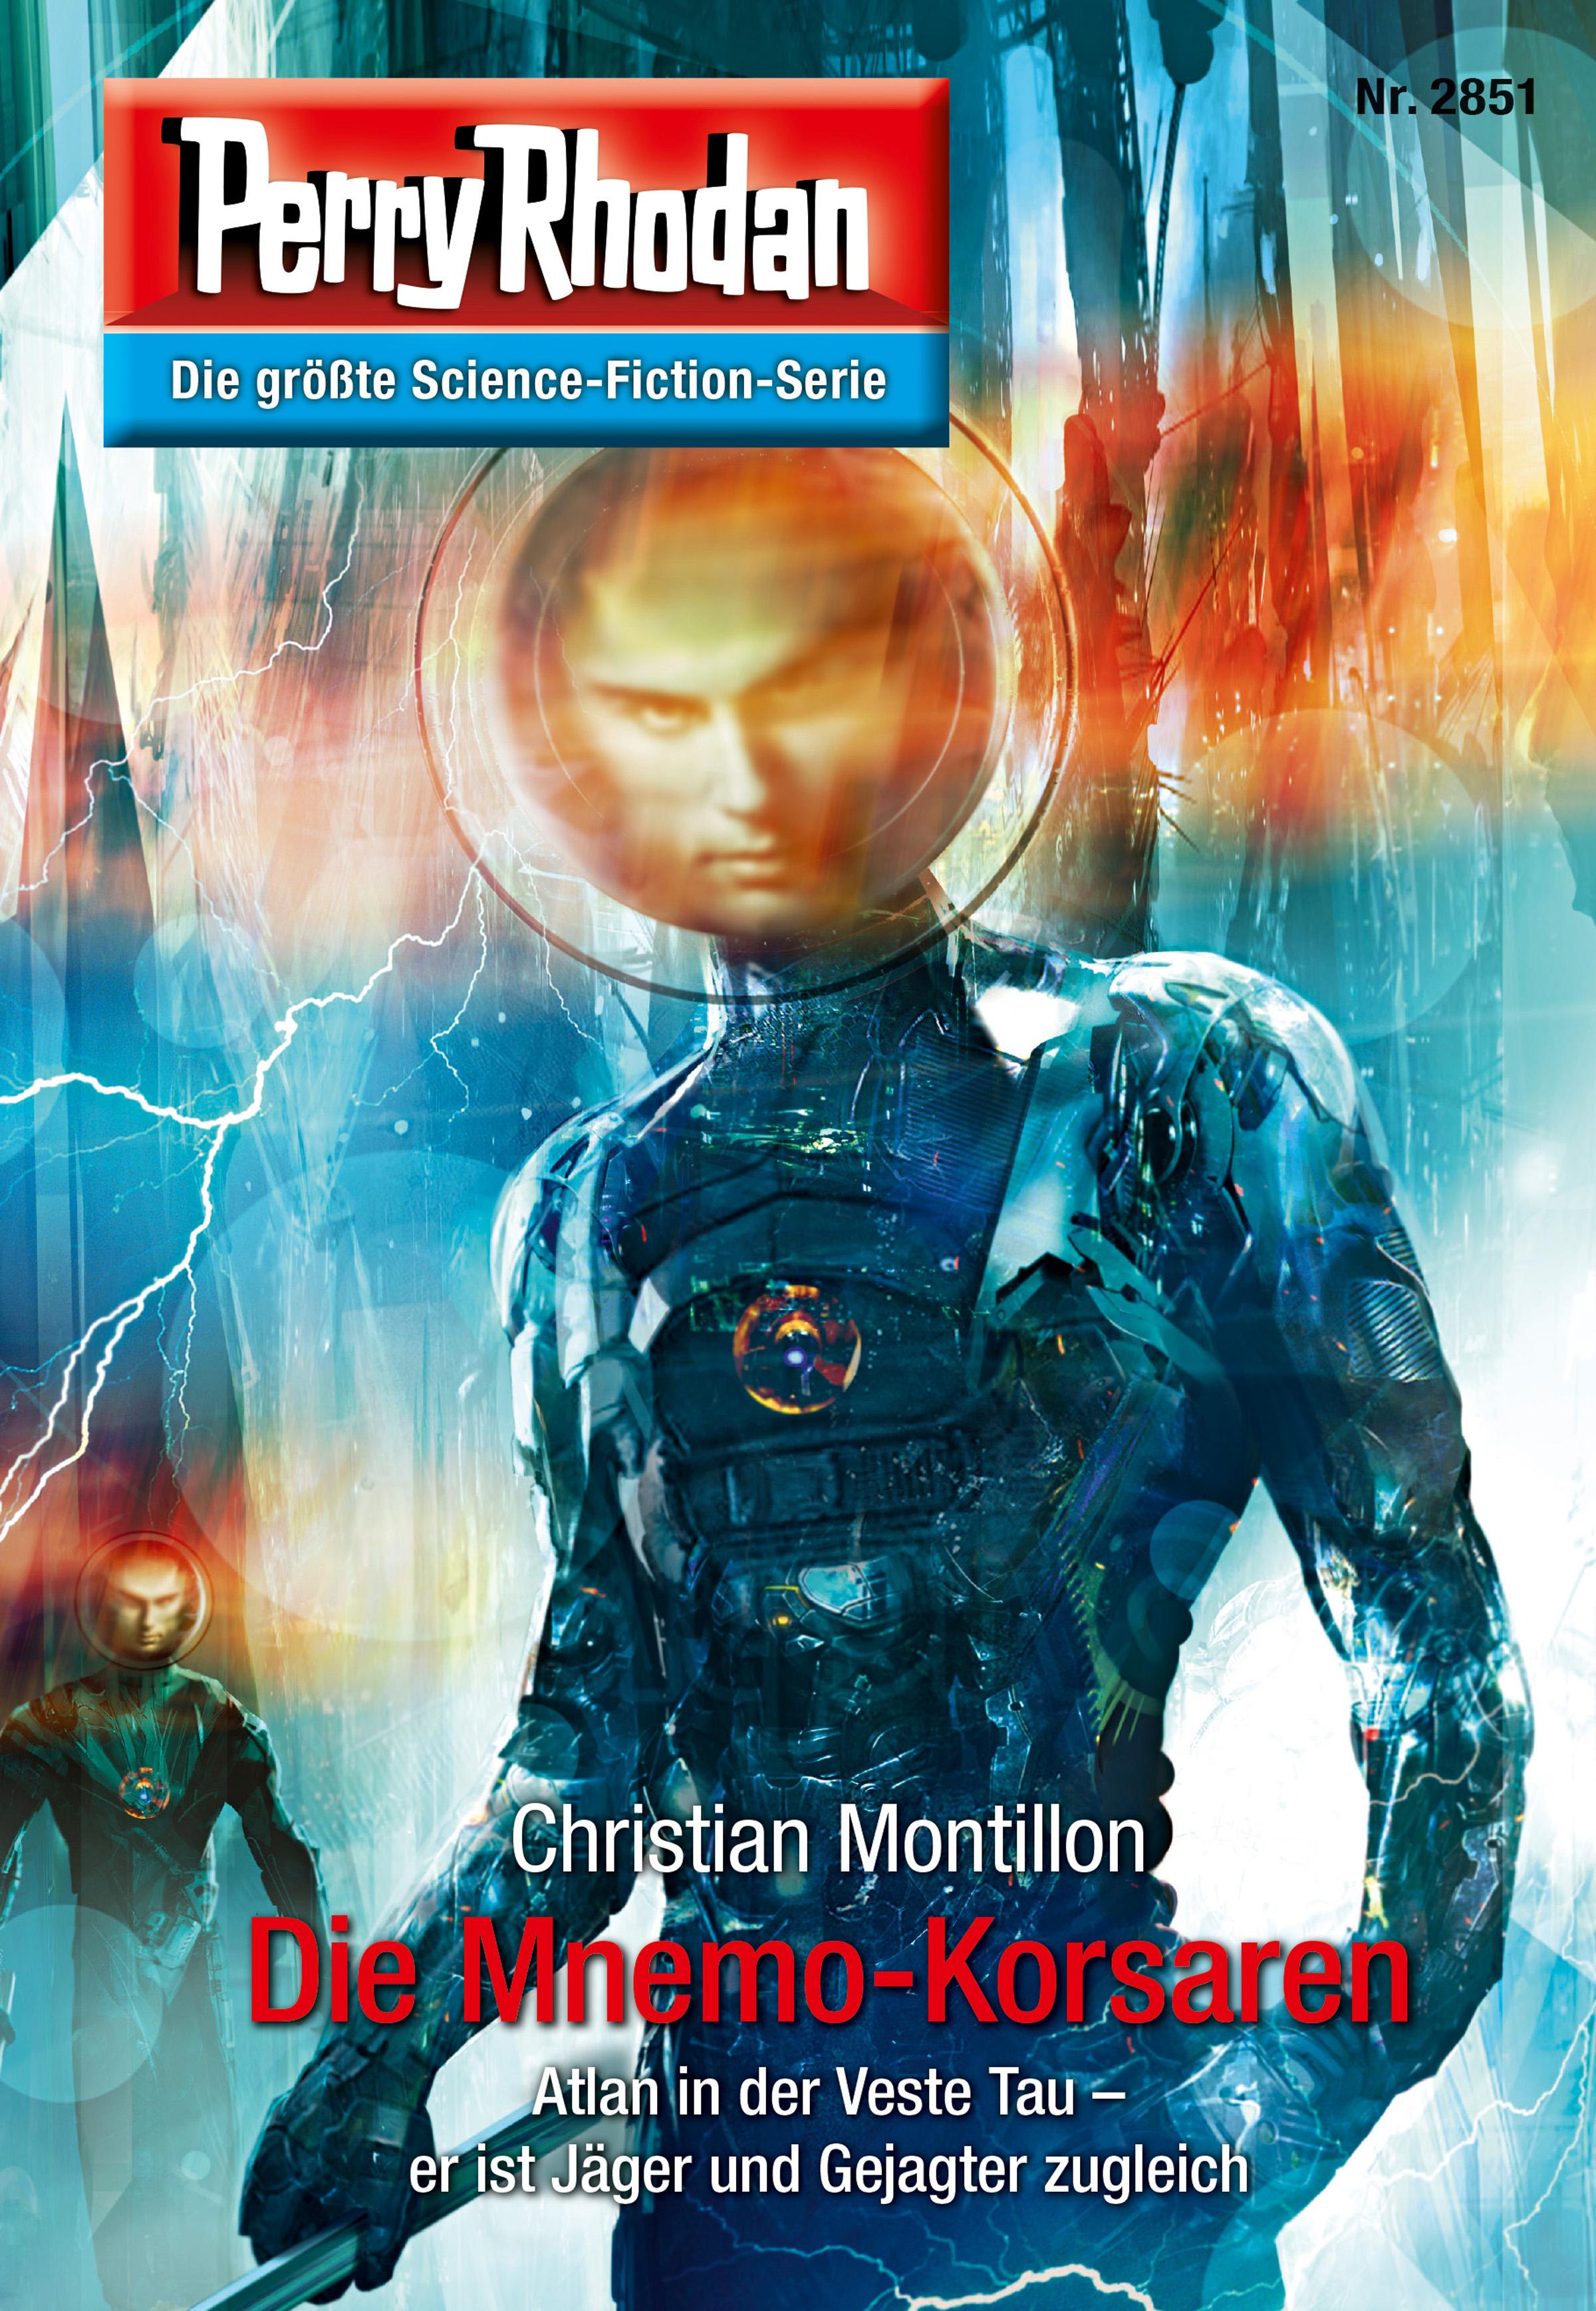 цена Christian Montillon Perry Rhodan 2851: Die Mnemo-Korsaren